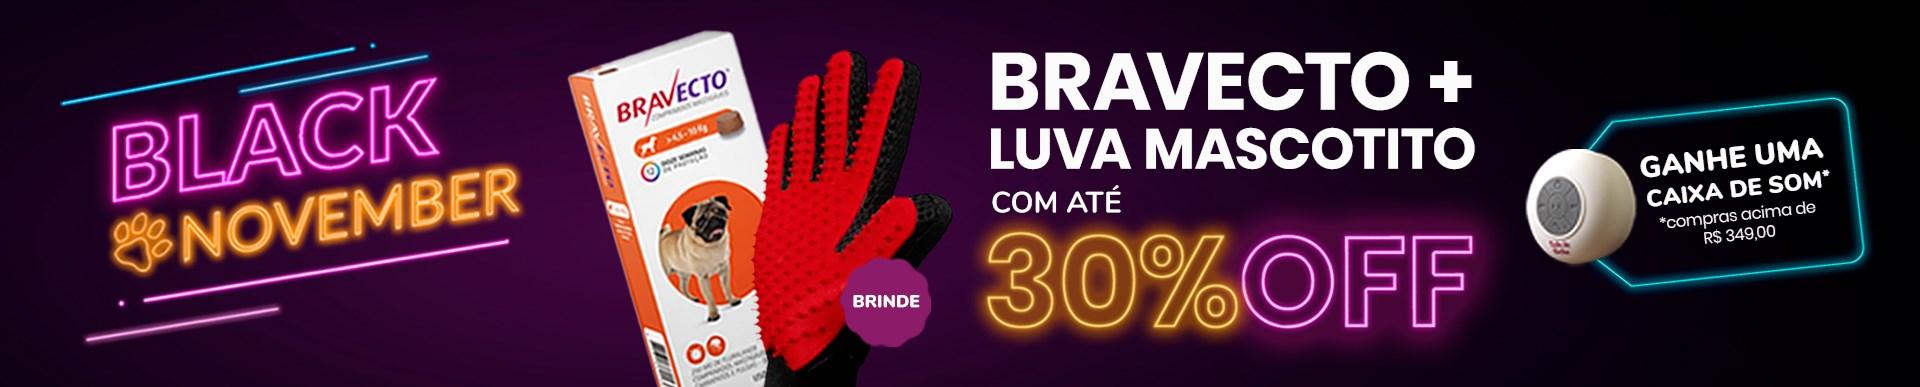 Black November - Banner de Categoria - Bravecto